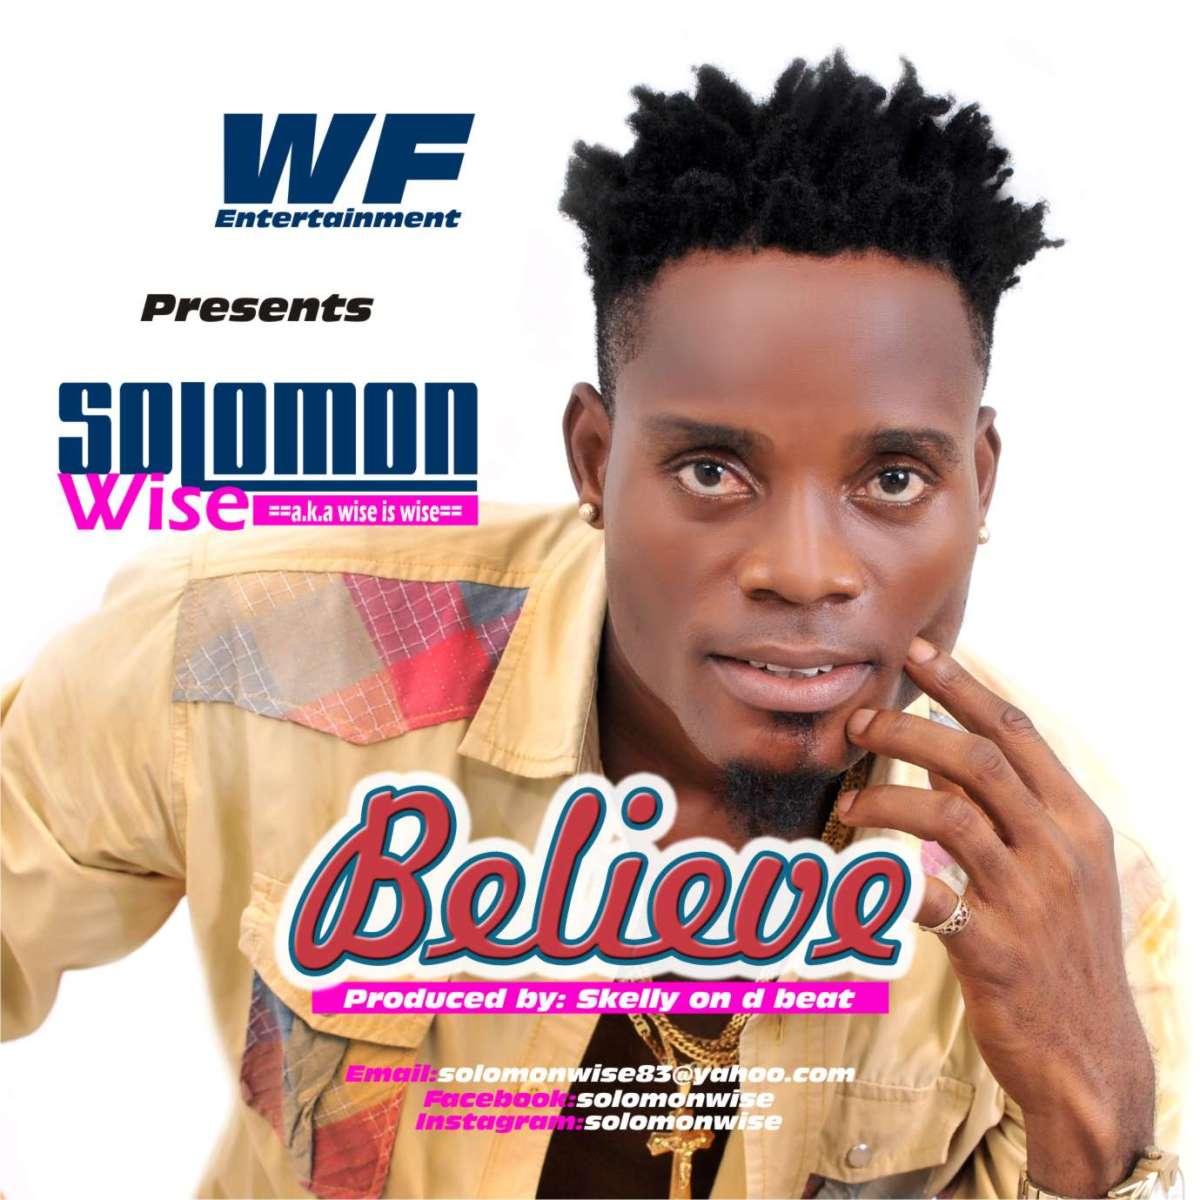 SolomonWise - Believe | @KINGKOKOTY12 | http://bit.ly/2iBSsSp | #UberTalksMusic